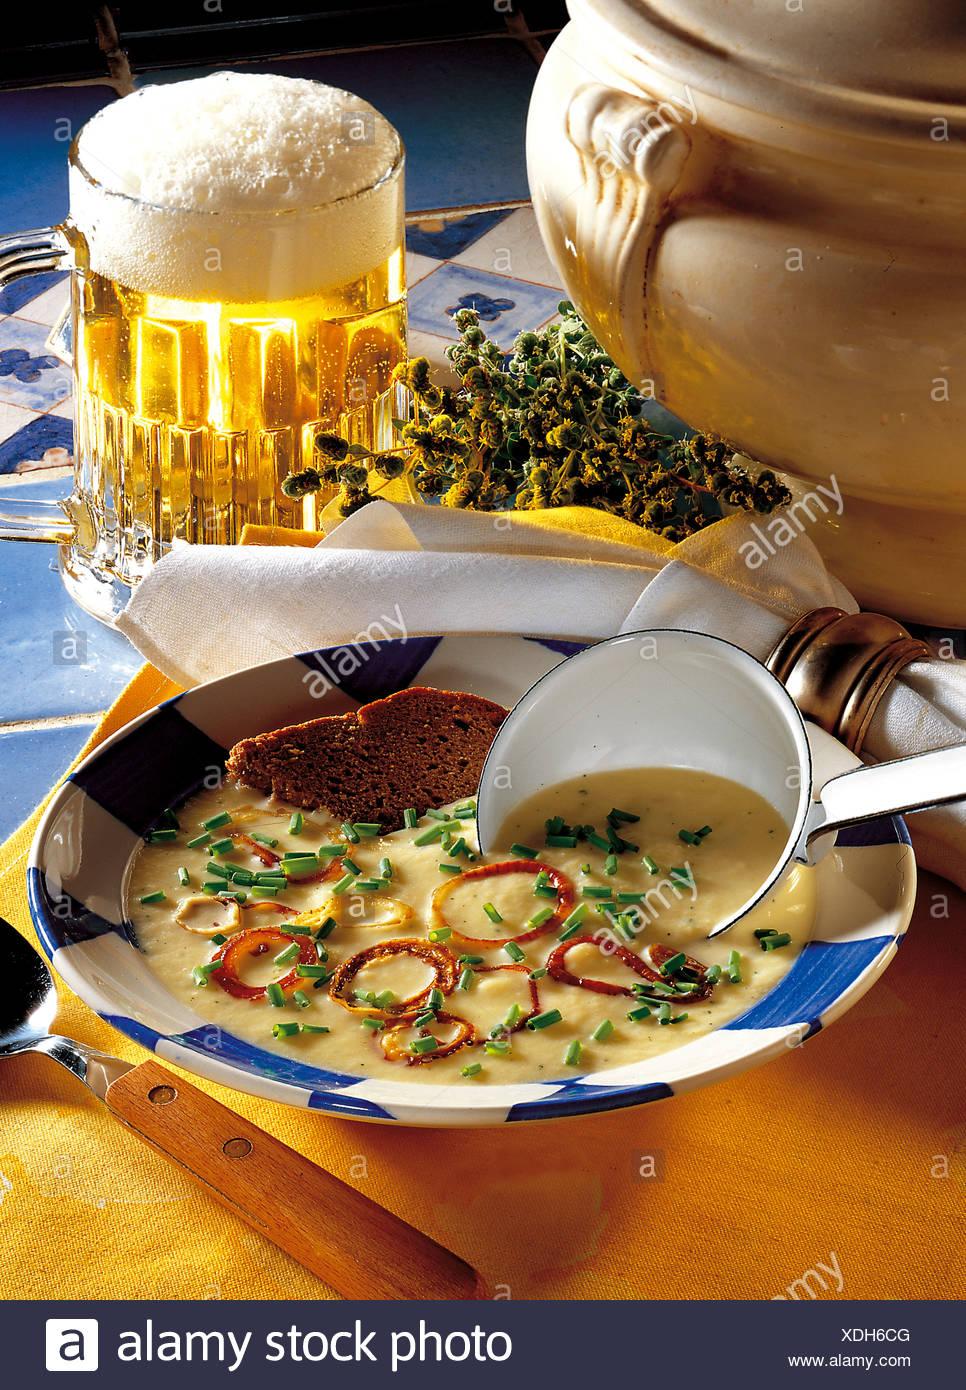 Old german potato soup vegetarian stew germany recipe available old german potato soup vegetarian stew germany recipe available for a fee forumfinder Gallery